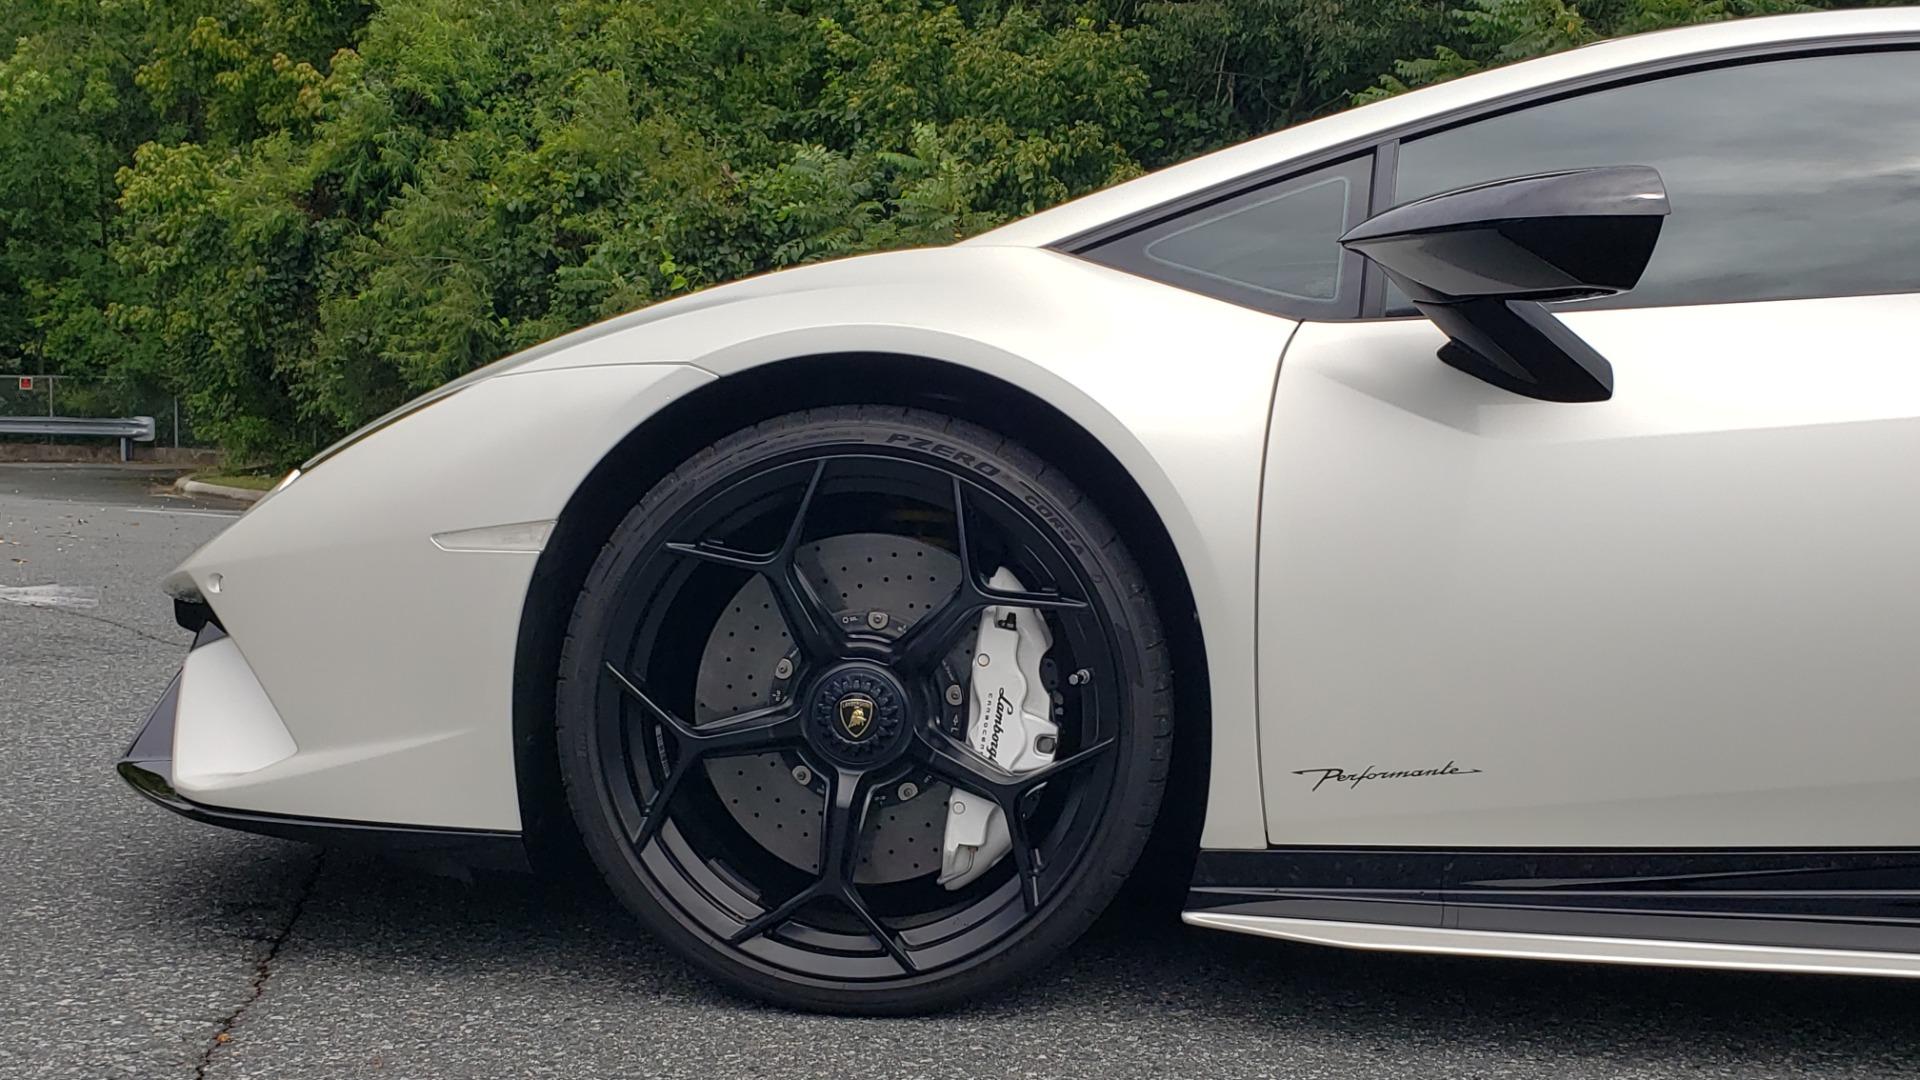 Used 2018 Lamborghini HURACAN PERFORMANTE 5.2L V10 / 630HP / 7-SPD AUTO / AWD / NAV / PREM SND for sale $269,995 at Formula Imports in Charlotte NC 28227 80